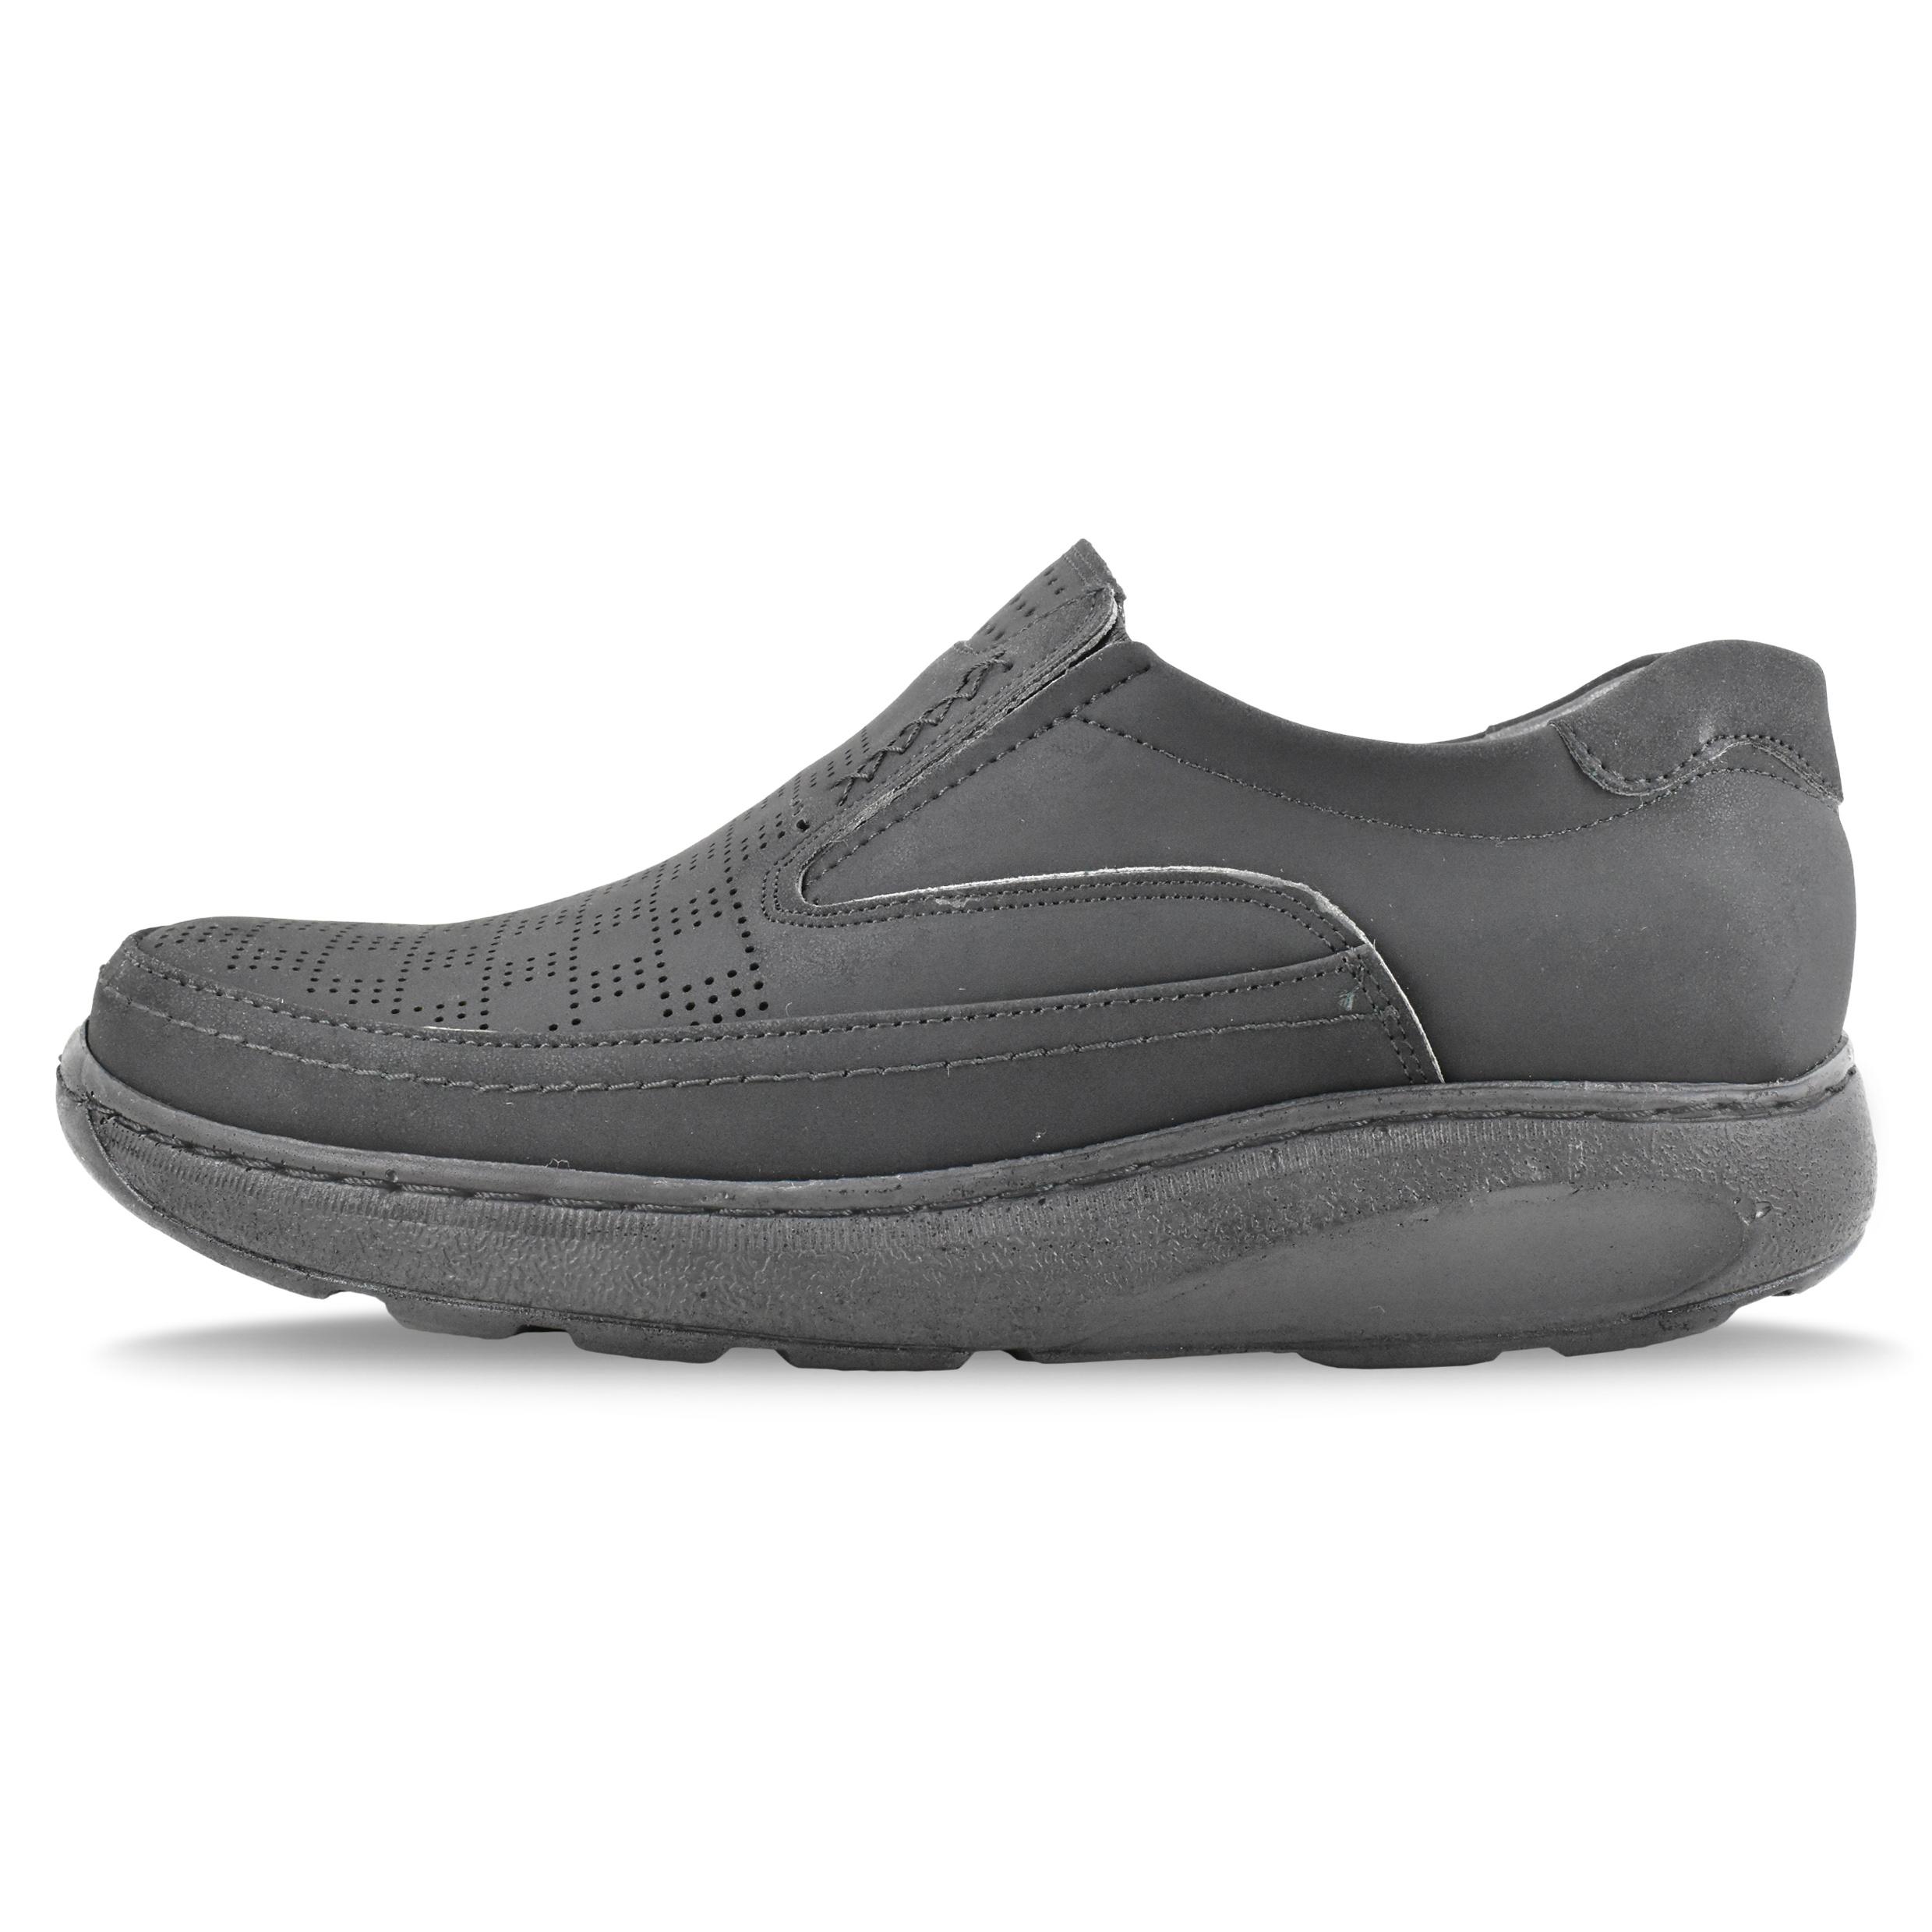 کفش روزمره مردانه مدل کاپرا کد 4412